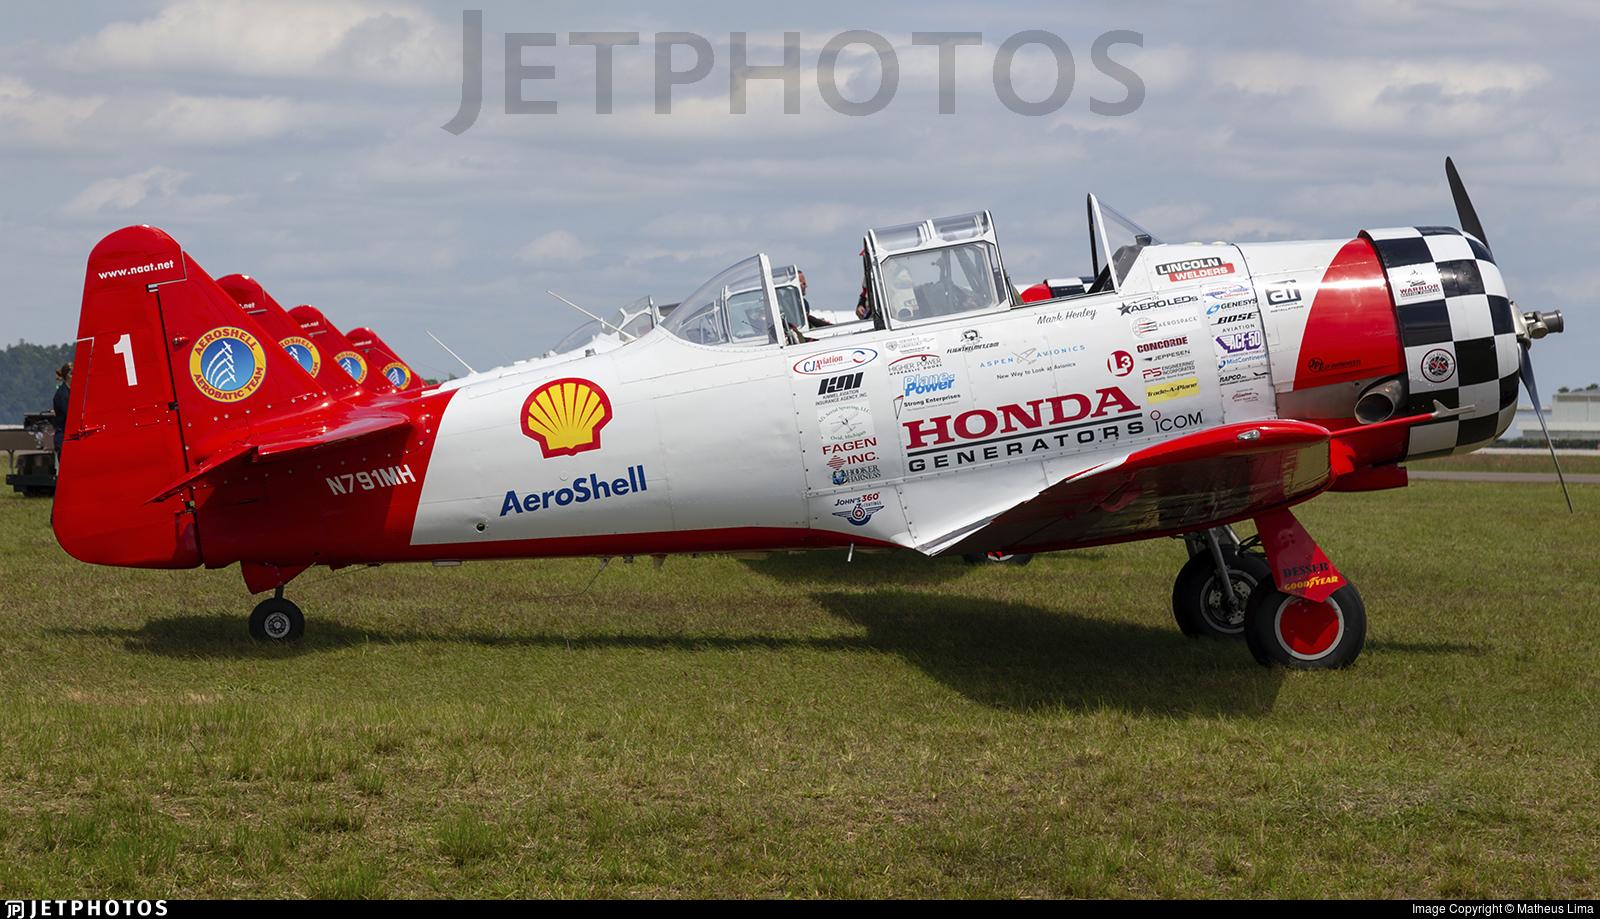 N791MH - North American AT-6G Texan - Aeroshell Aerobatic Team